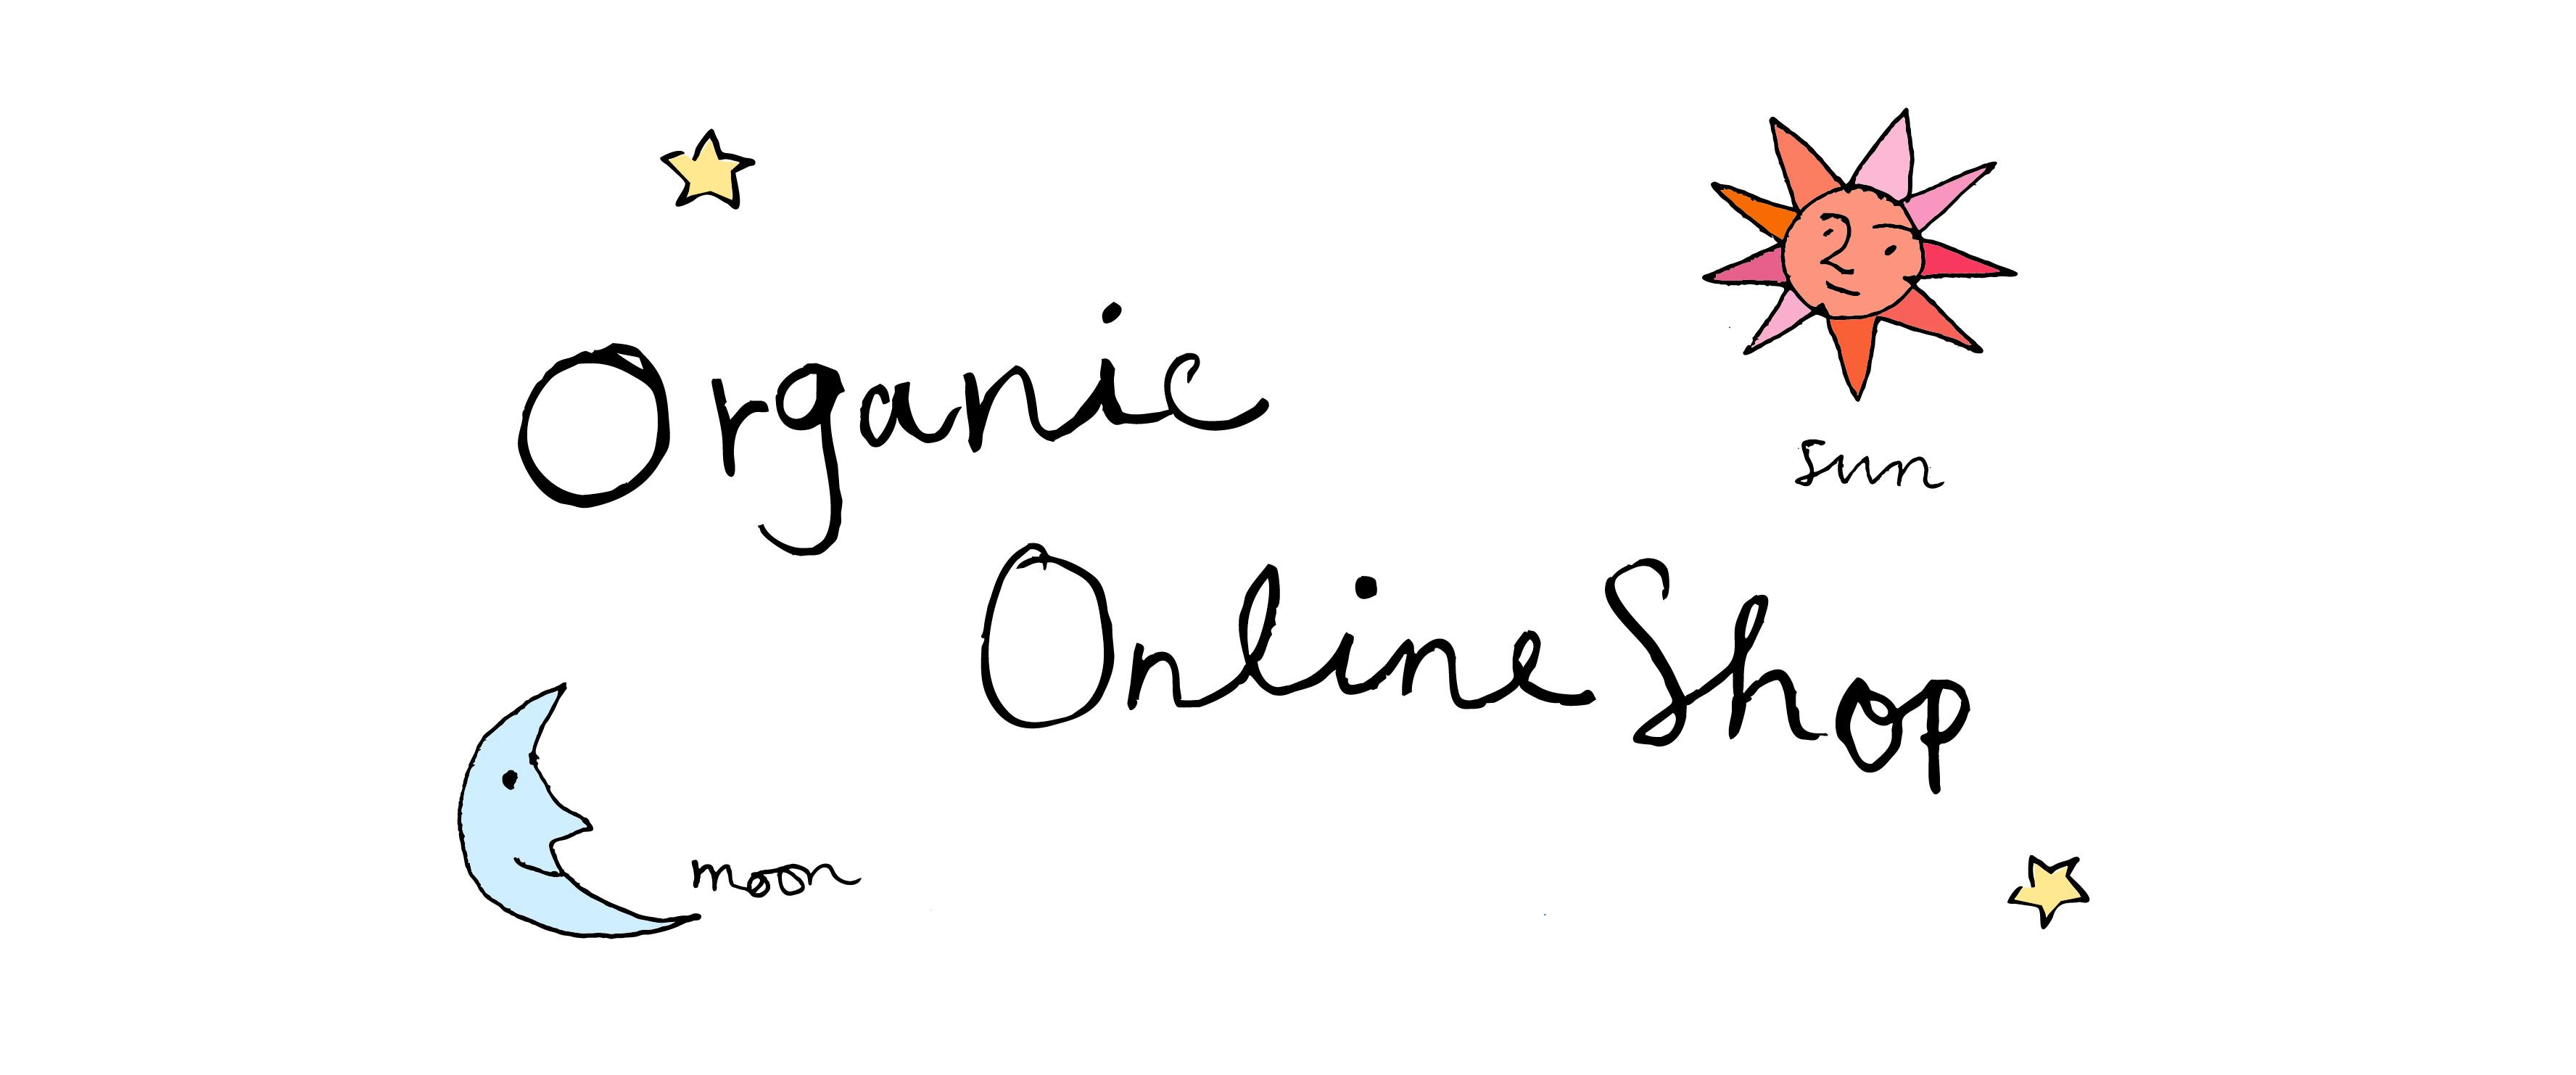 manos organic online shop